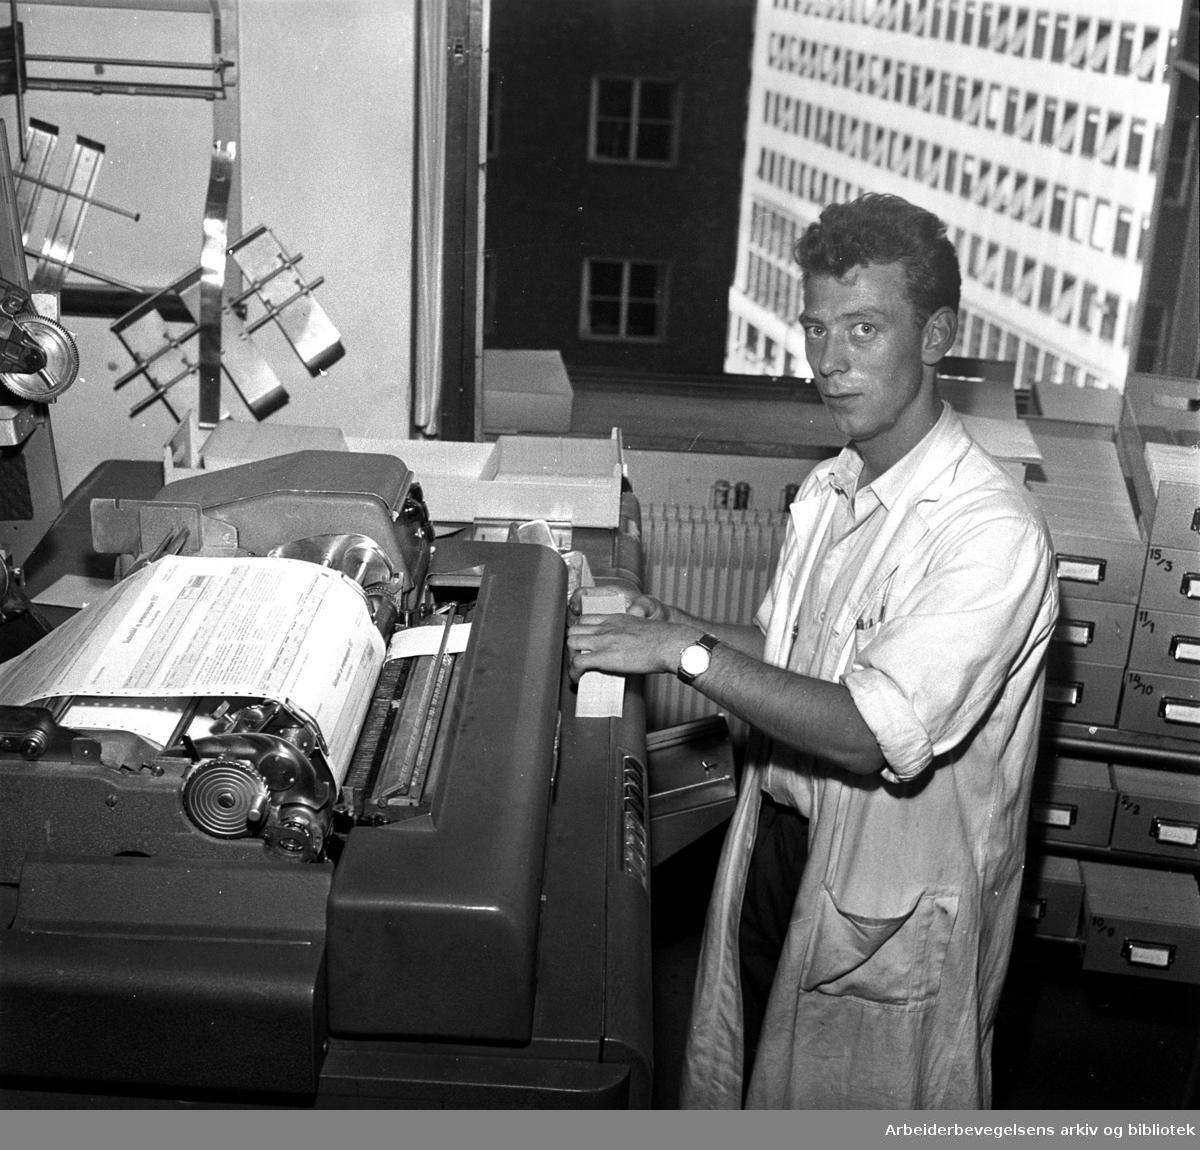 Hullkortavdelingen i Rådhuset .september 1958